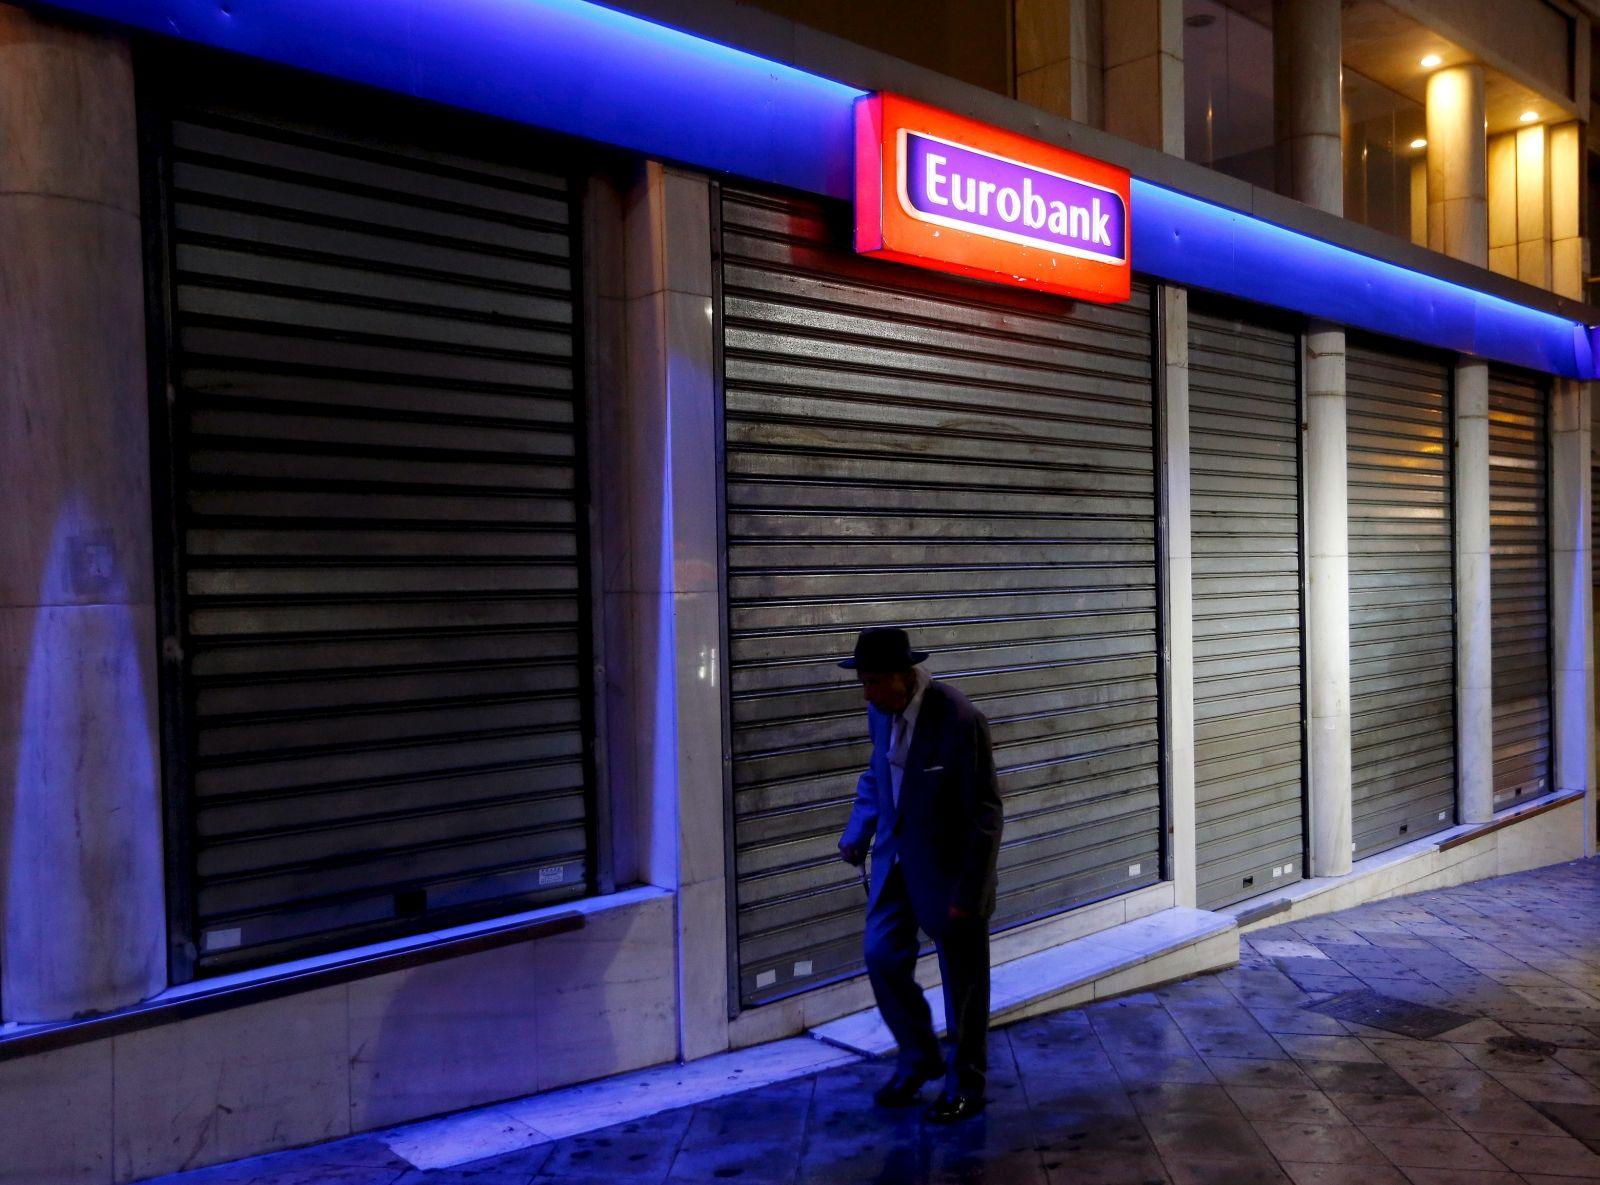 Capital Controls in Greece